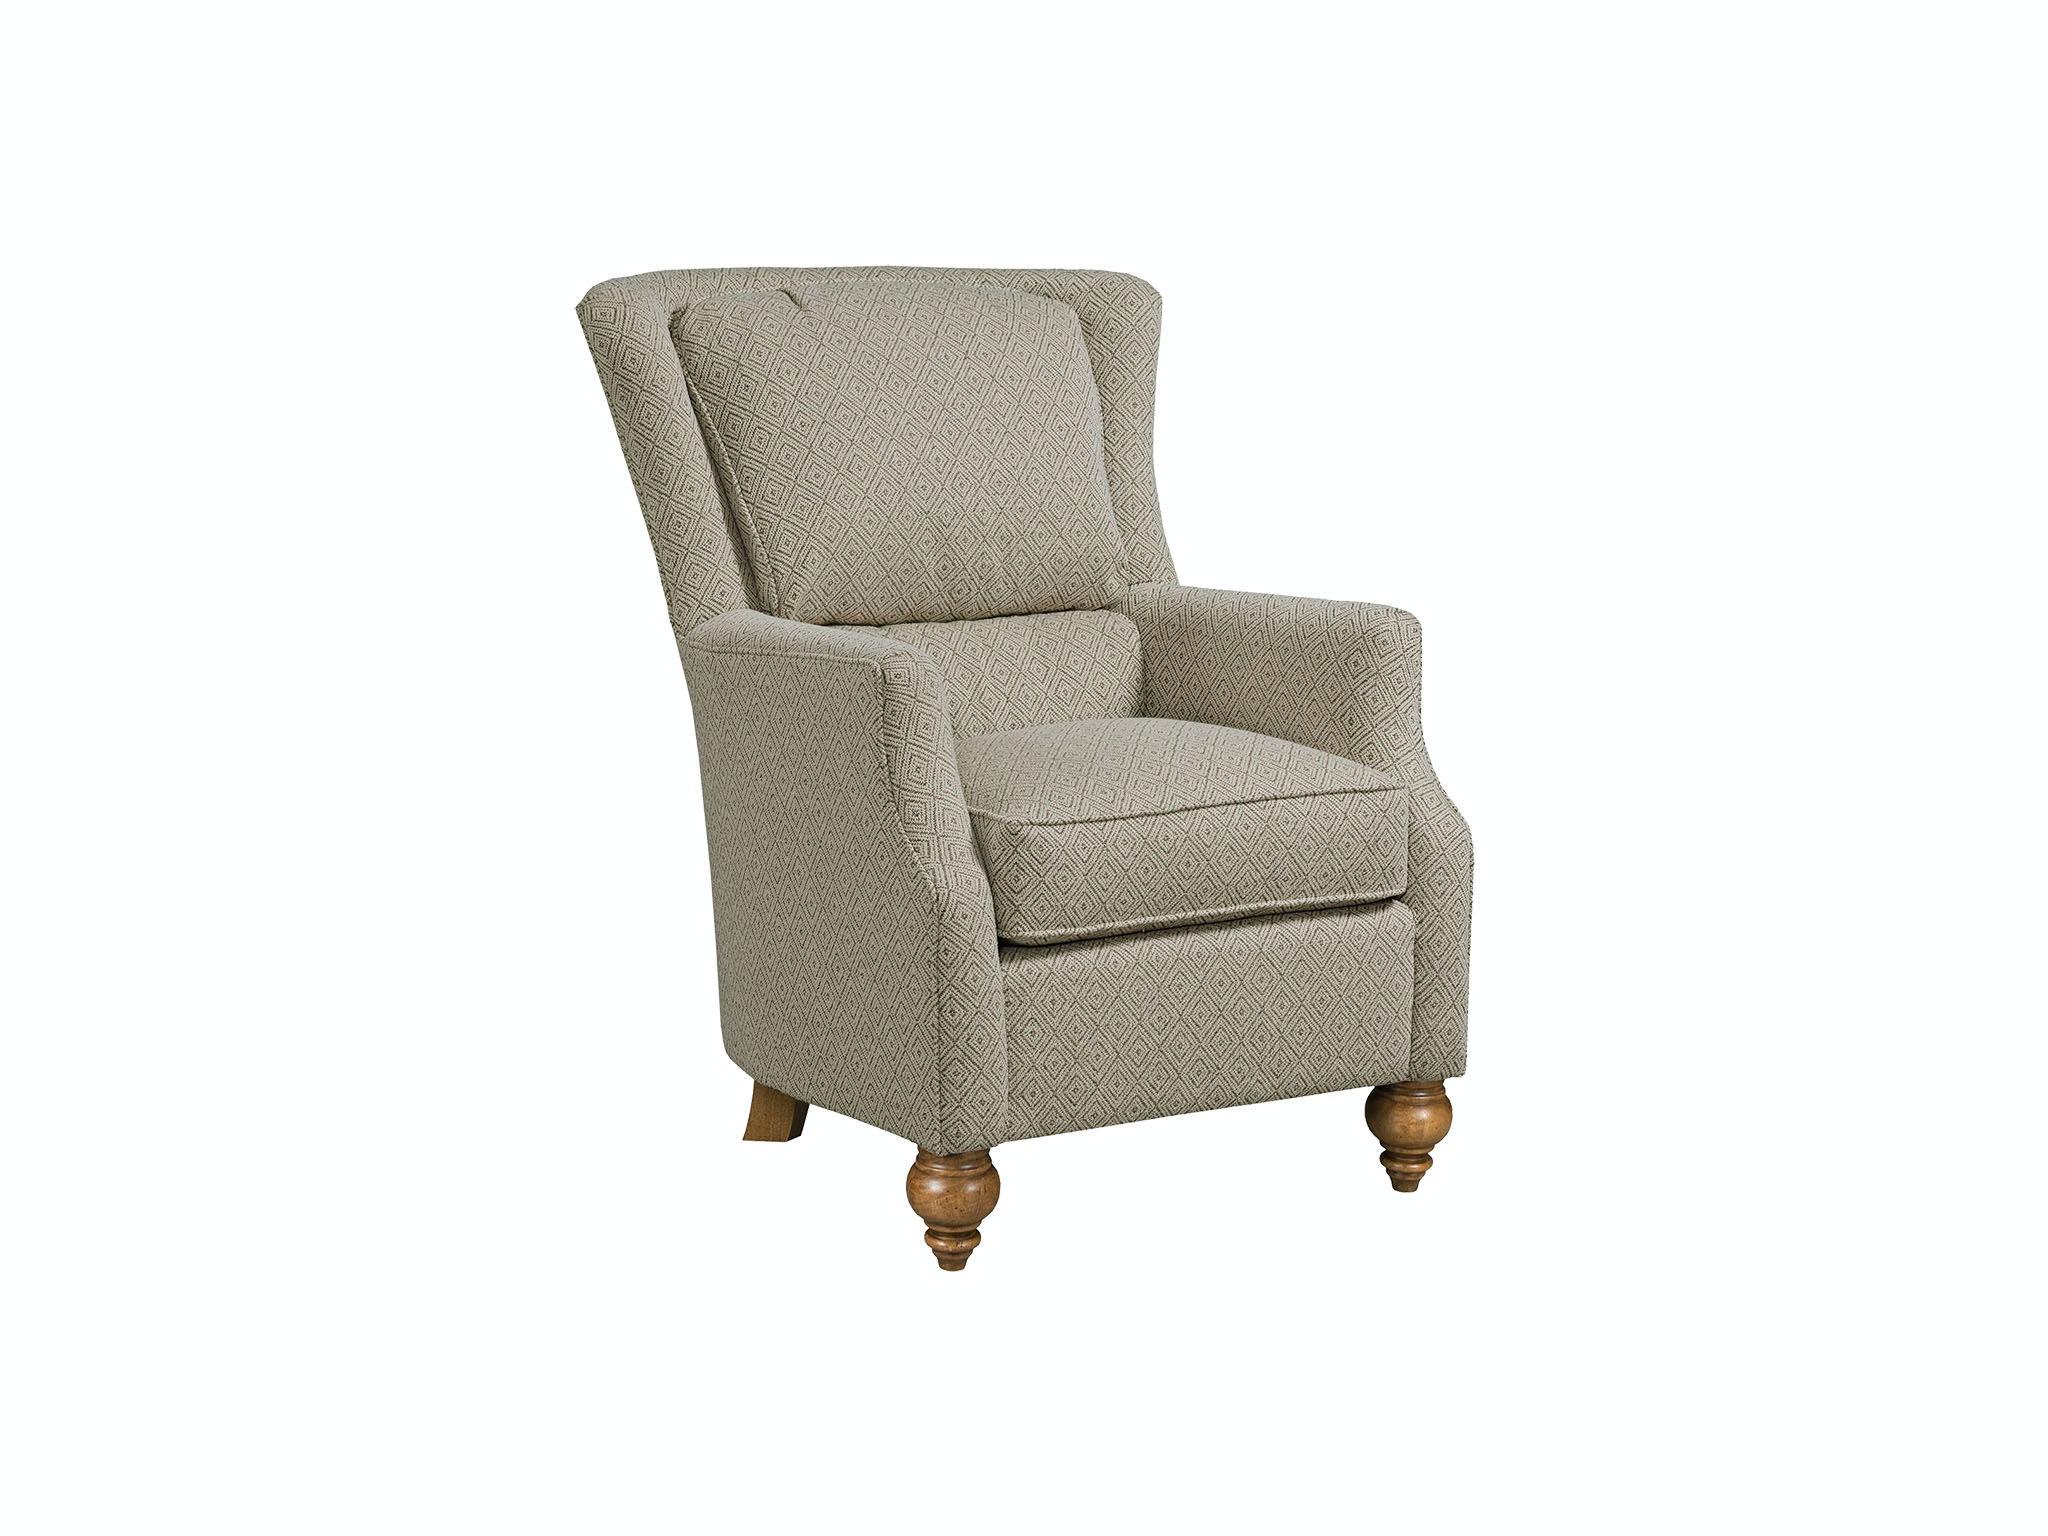 Kincaid Furniture Benjamin Chair 004 00